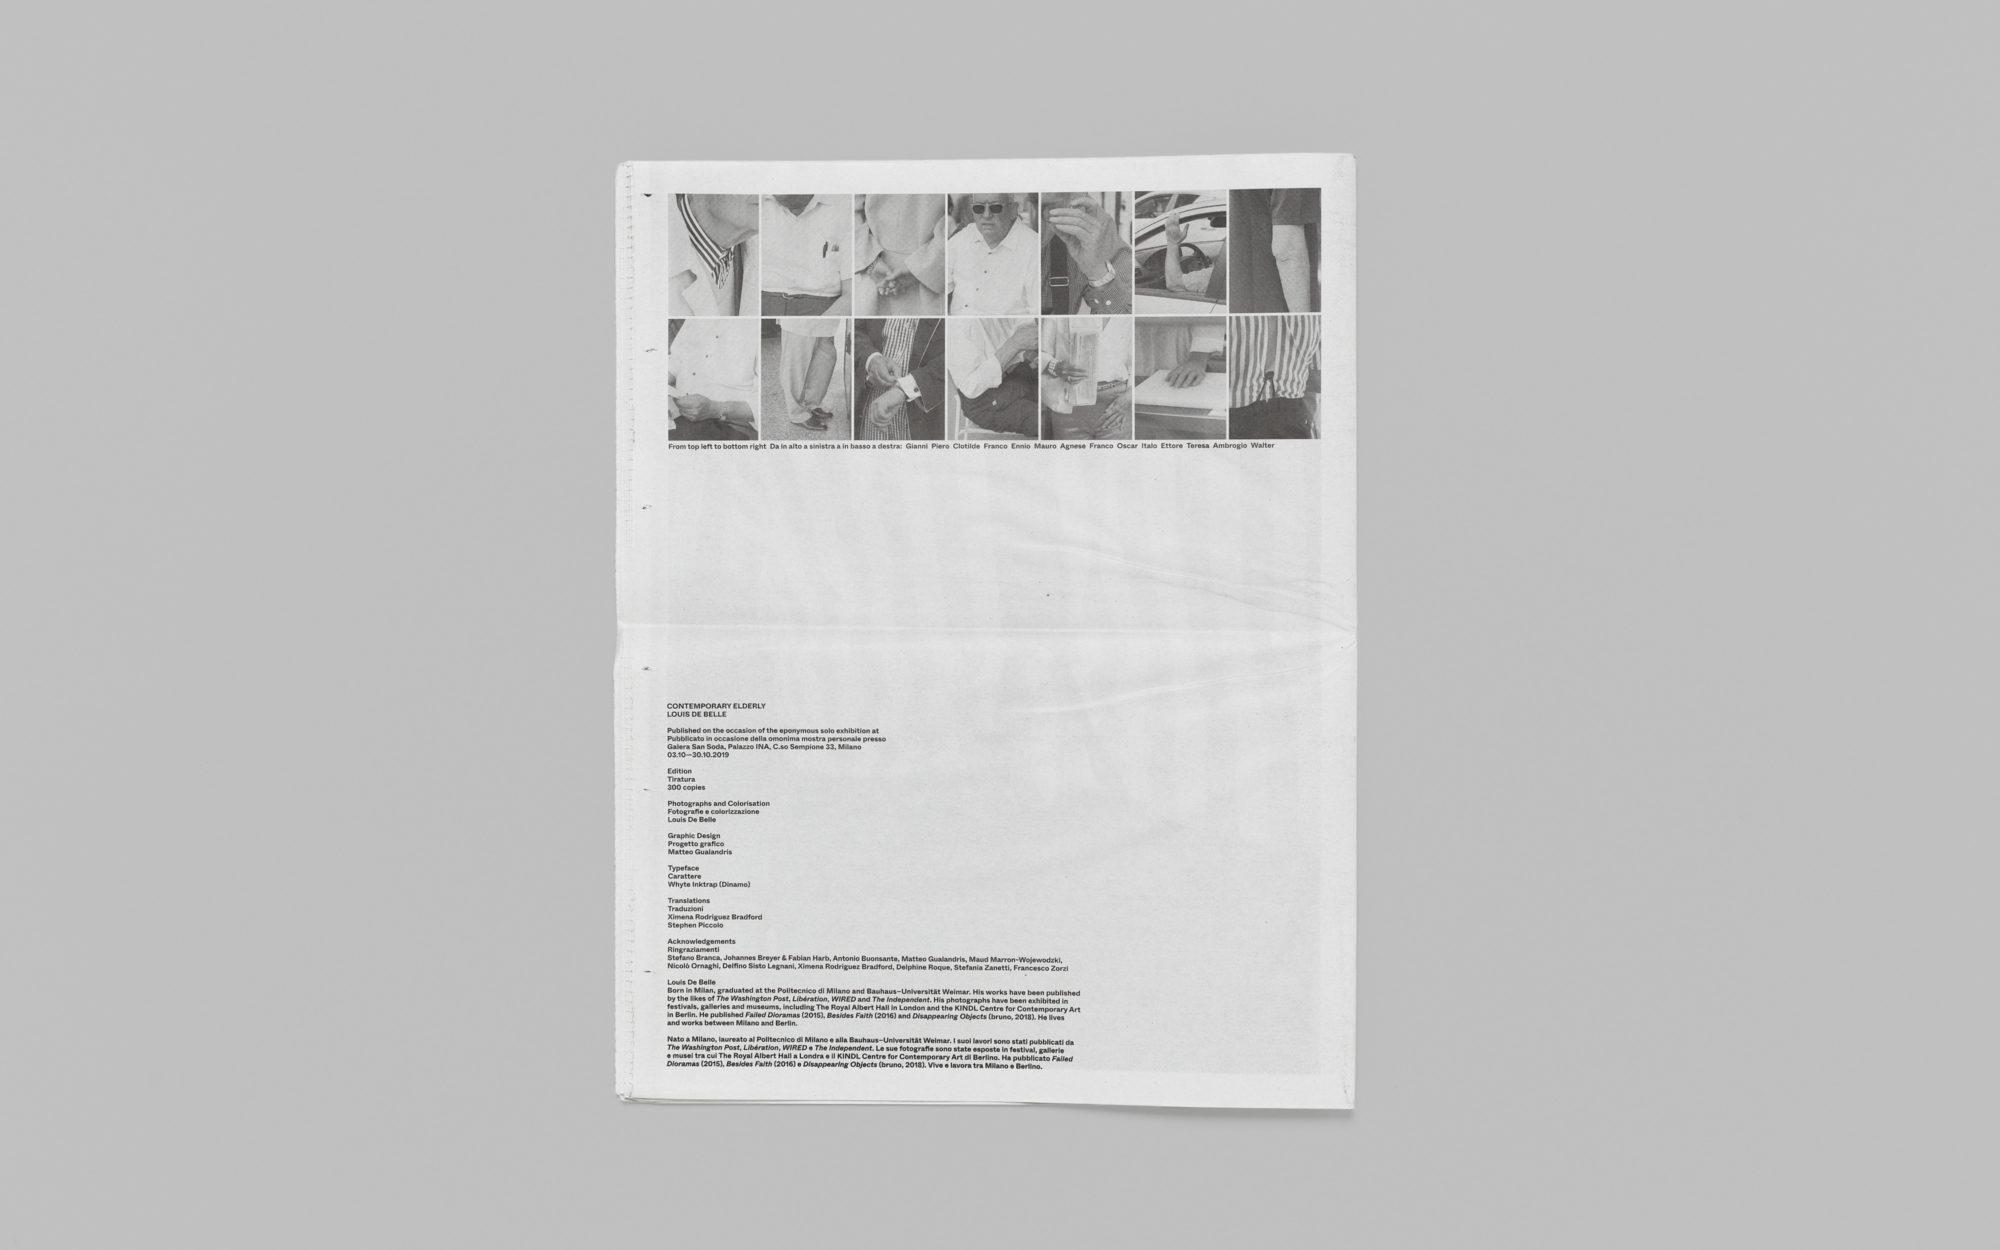 Mostra Design Milano 2018 matteo gualandris - art direction and graphic design